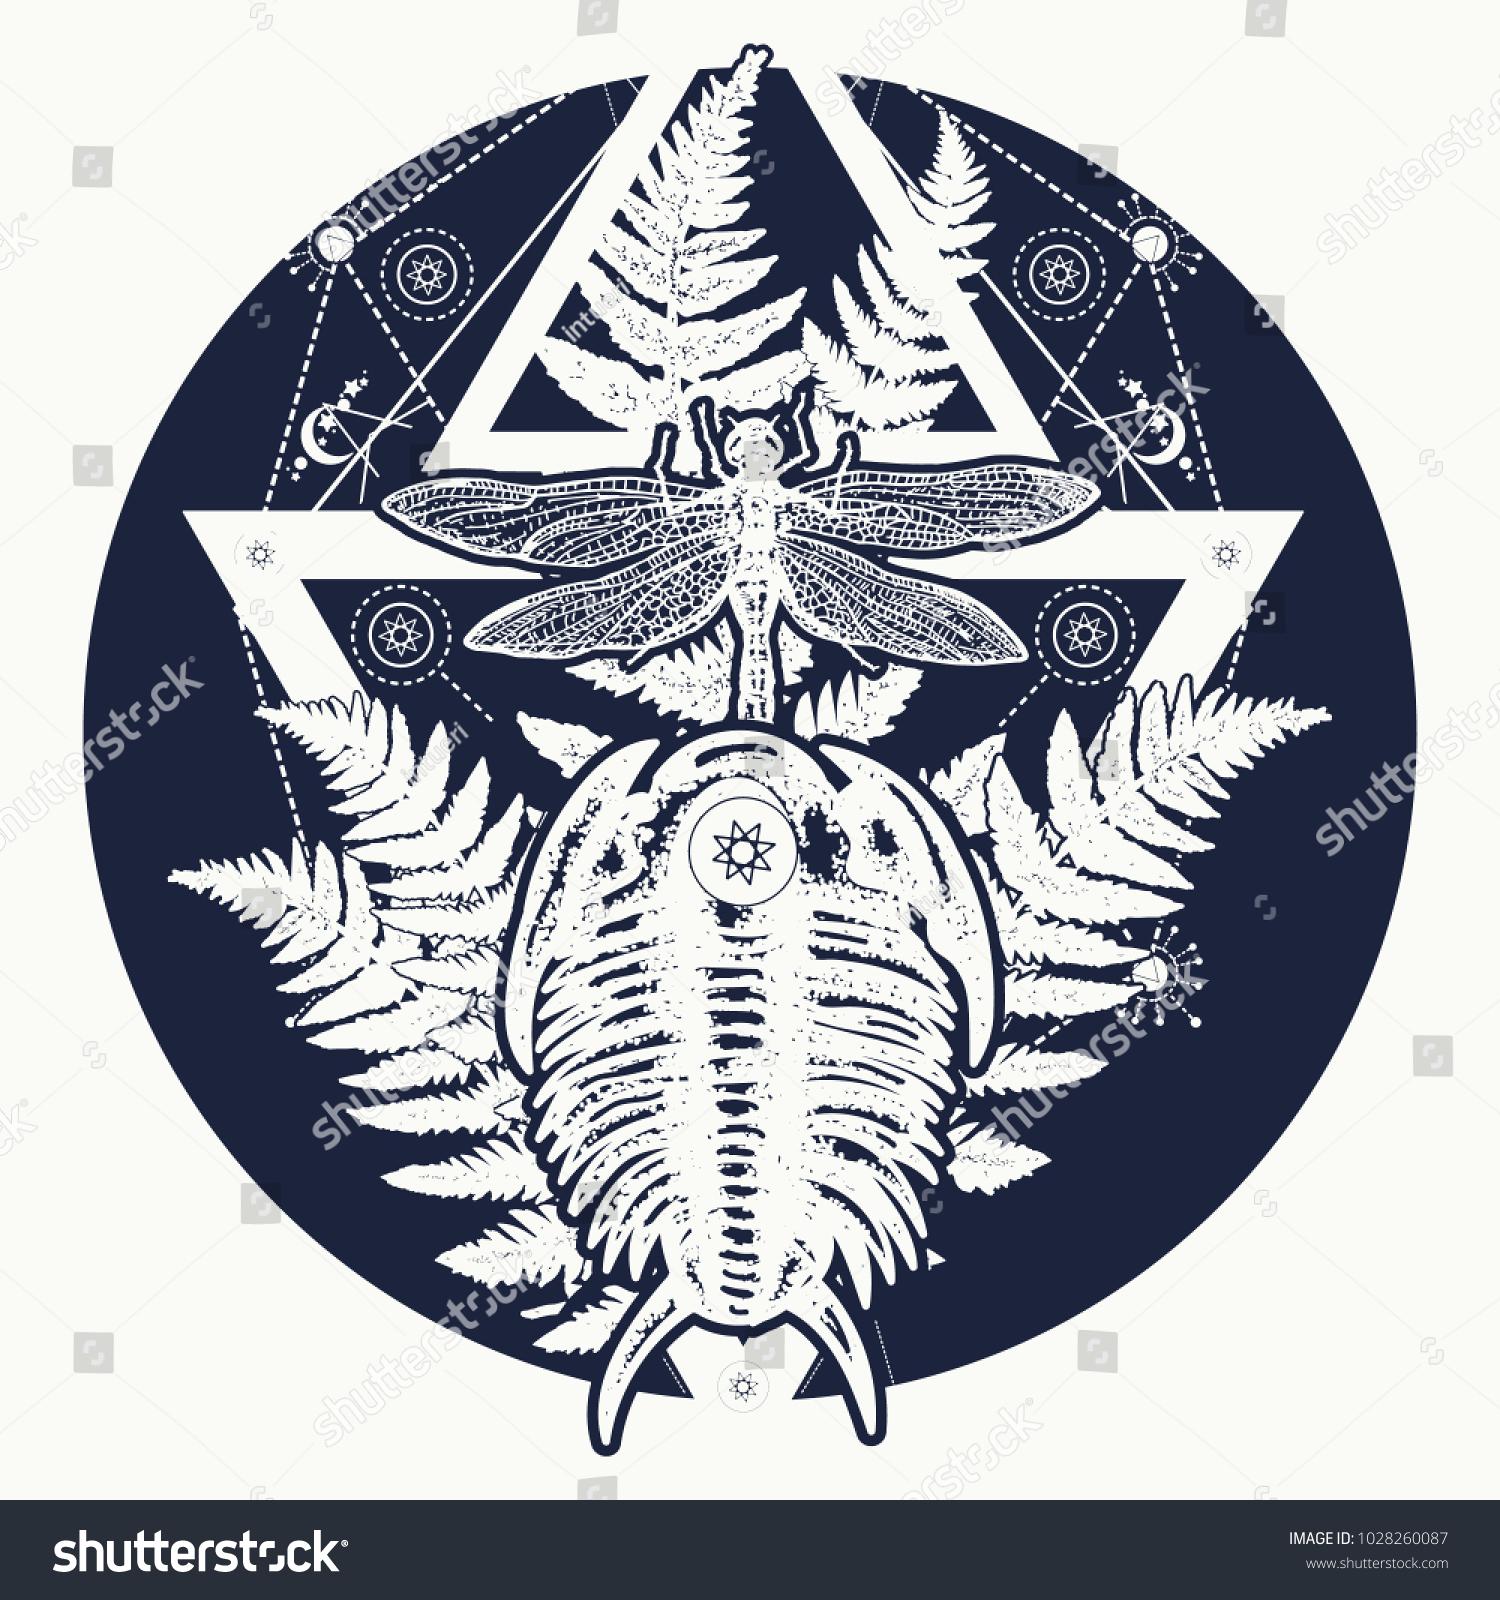 Prehistoric tattoo art symbol paleontology science stock vector prehistoric tattoo art symbol of paleontology science education trilobites dragonfly and biocorpaavc